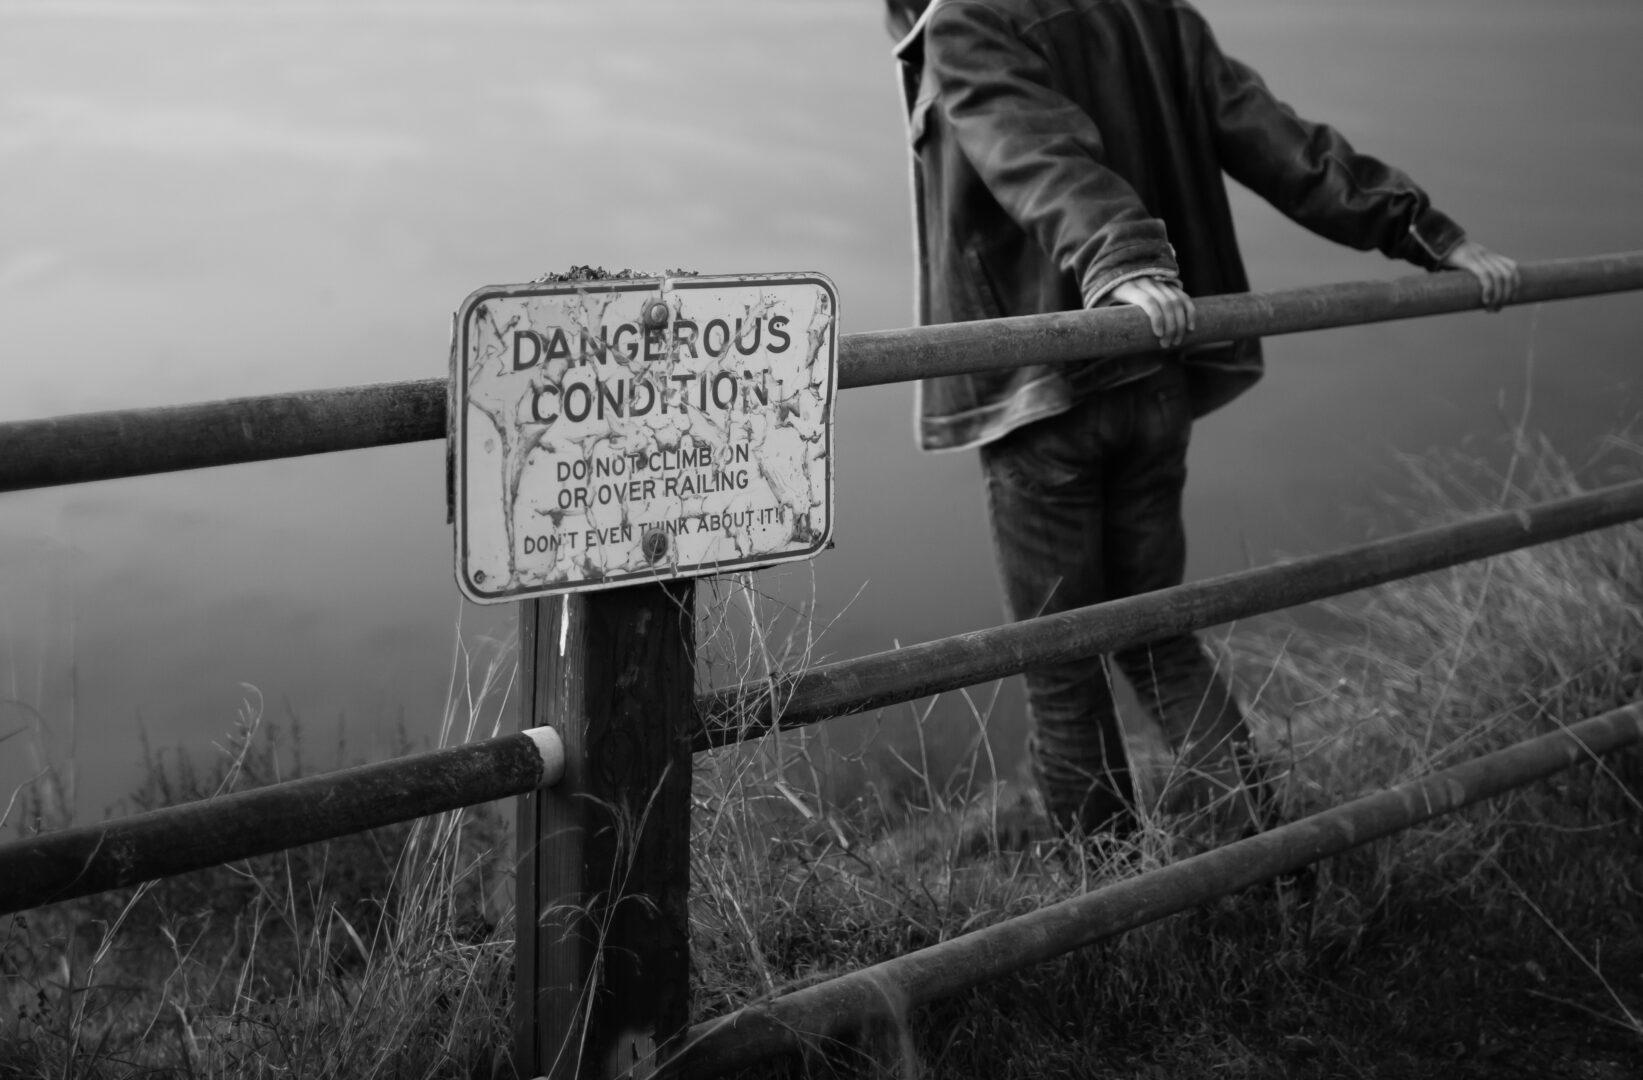 A man at the edge of a bridge, holding onto railings